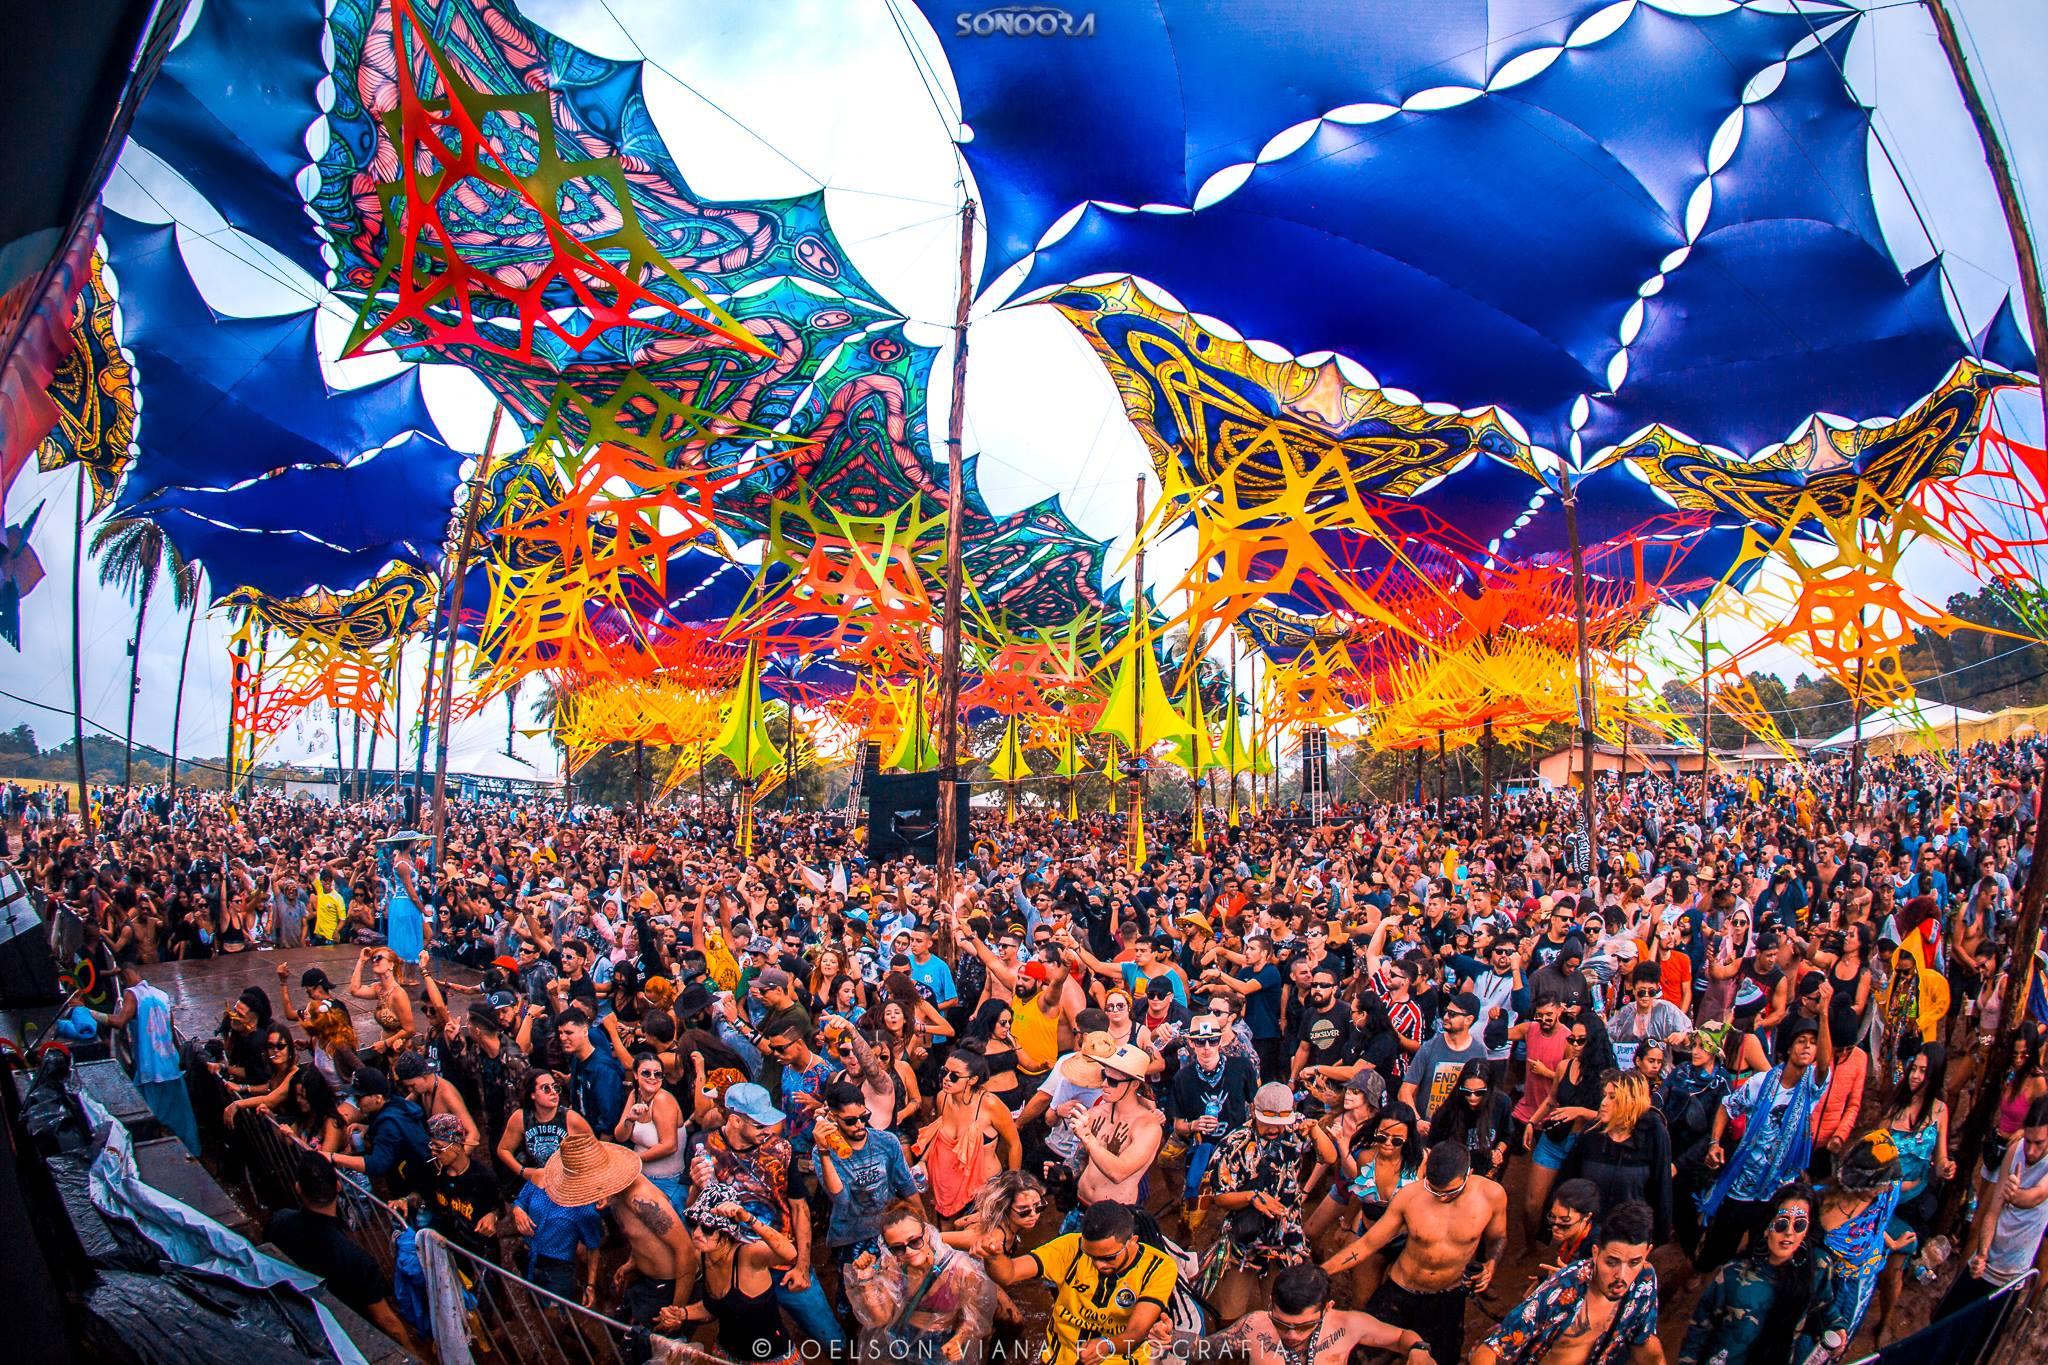 sonoora rave festival